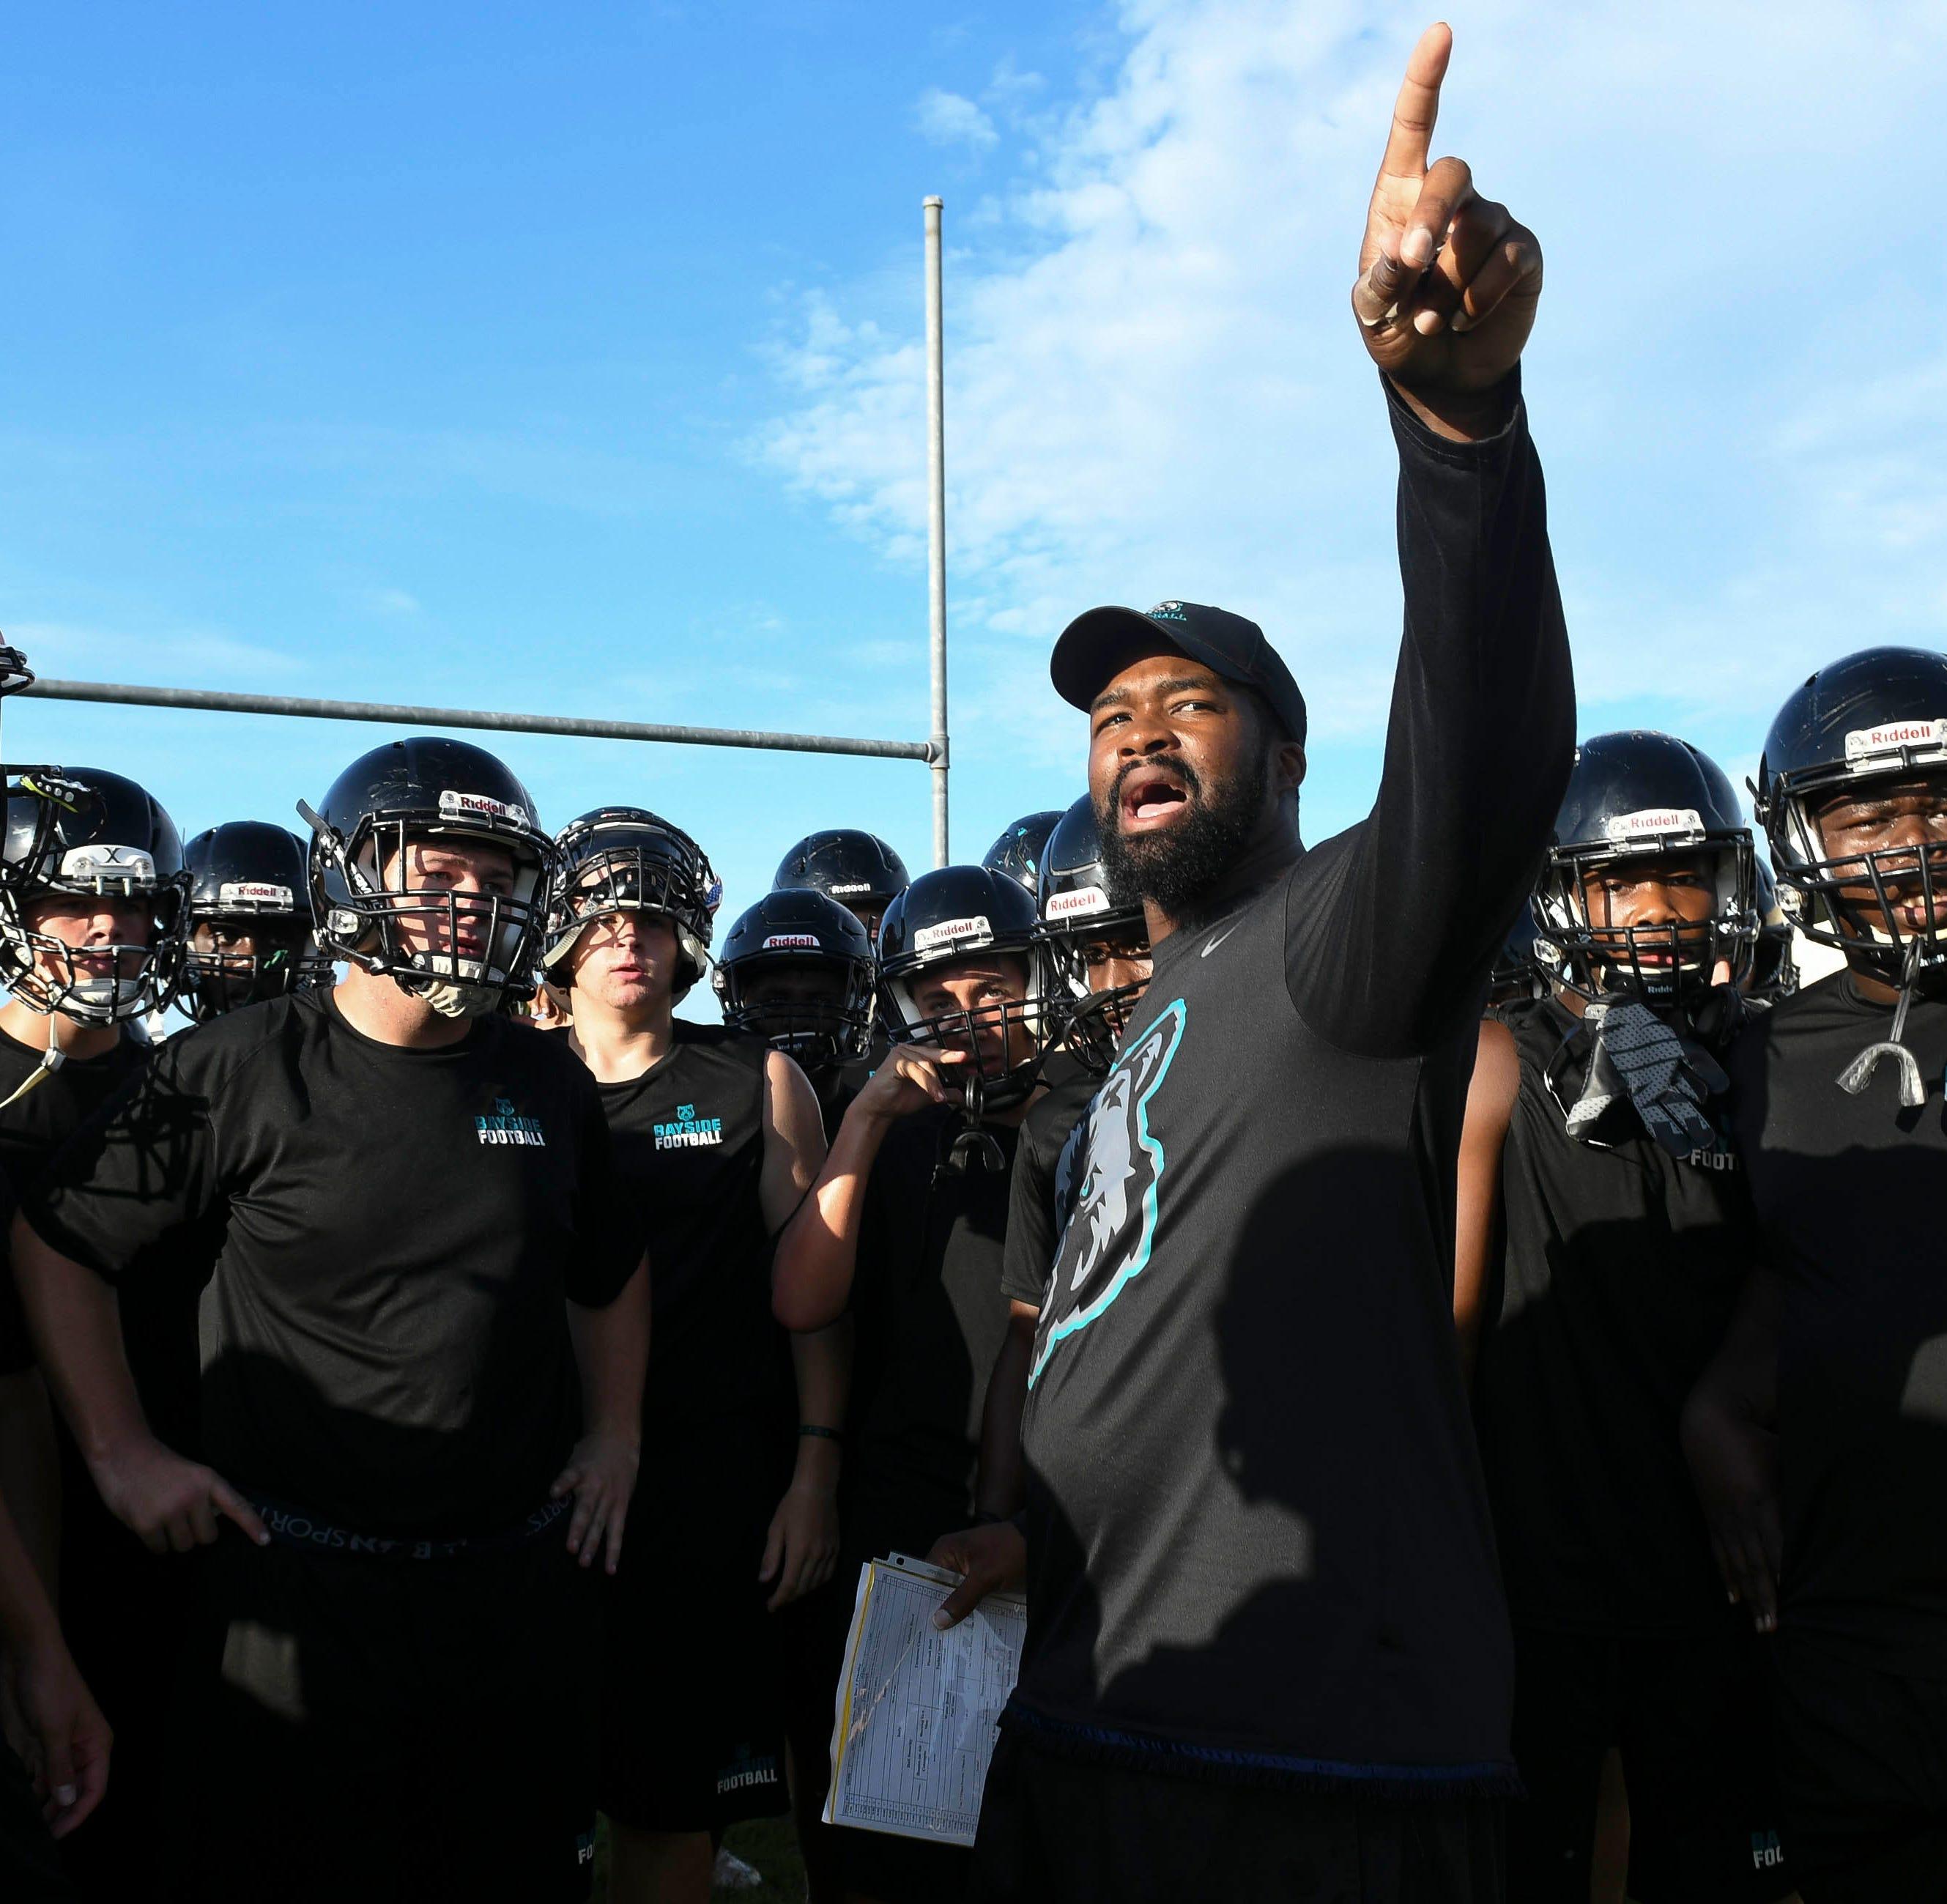 Tour of Brevard County high school football: Bayside Bears